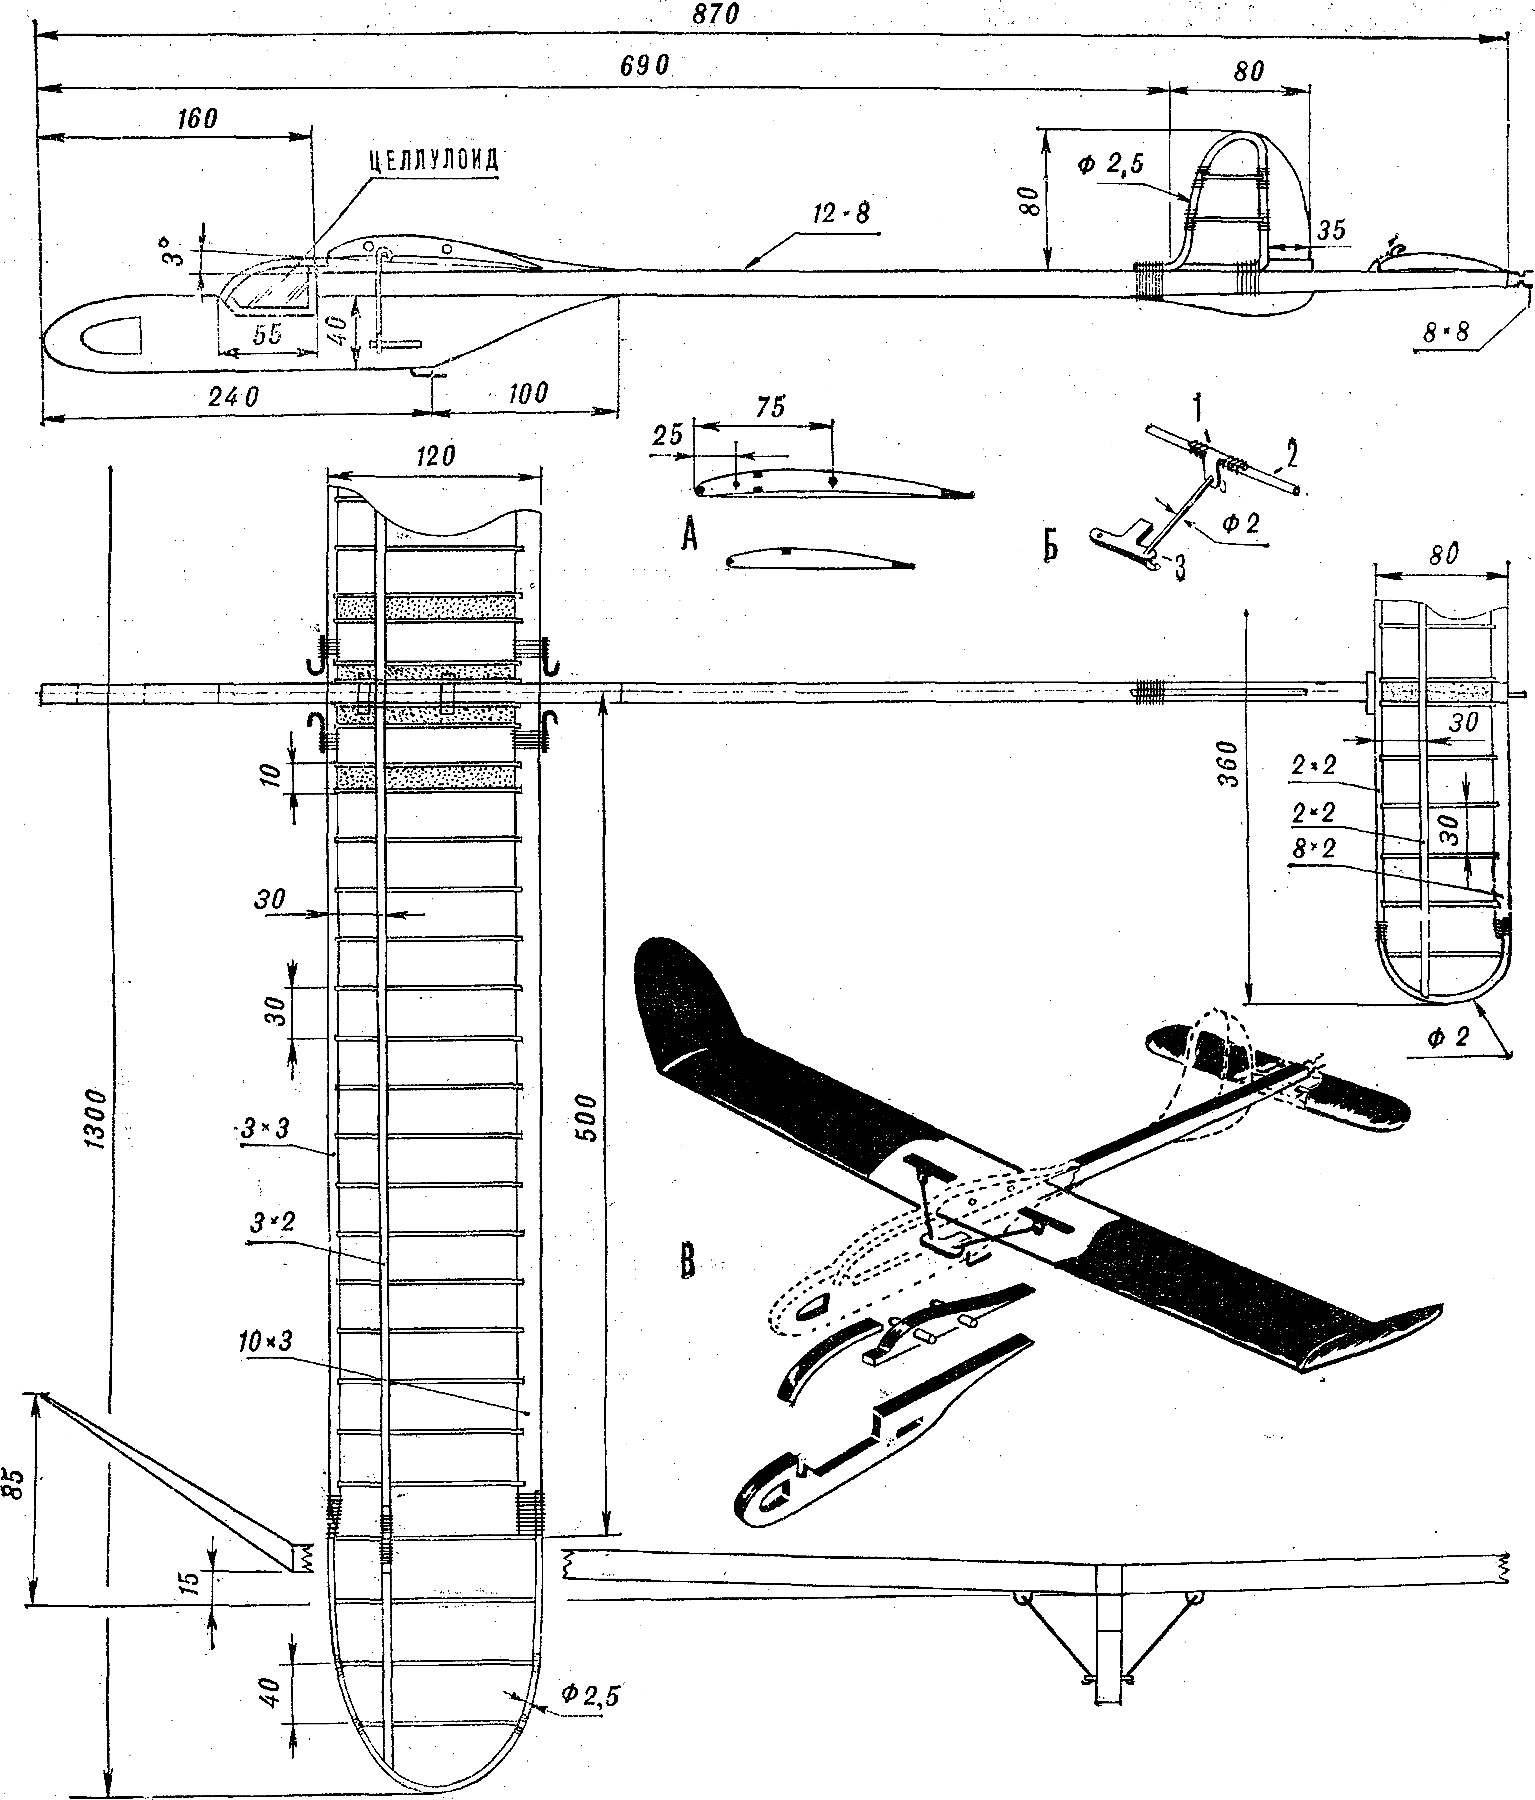 Рис. 2. Схема модели планера «Юниор» А-1